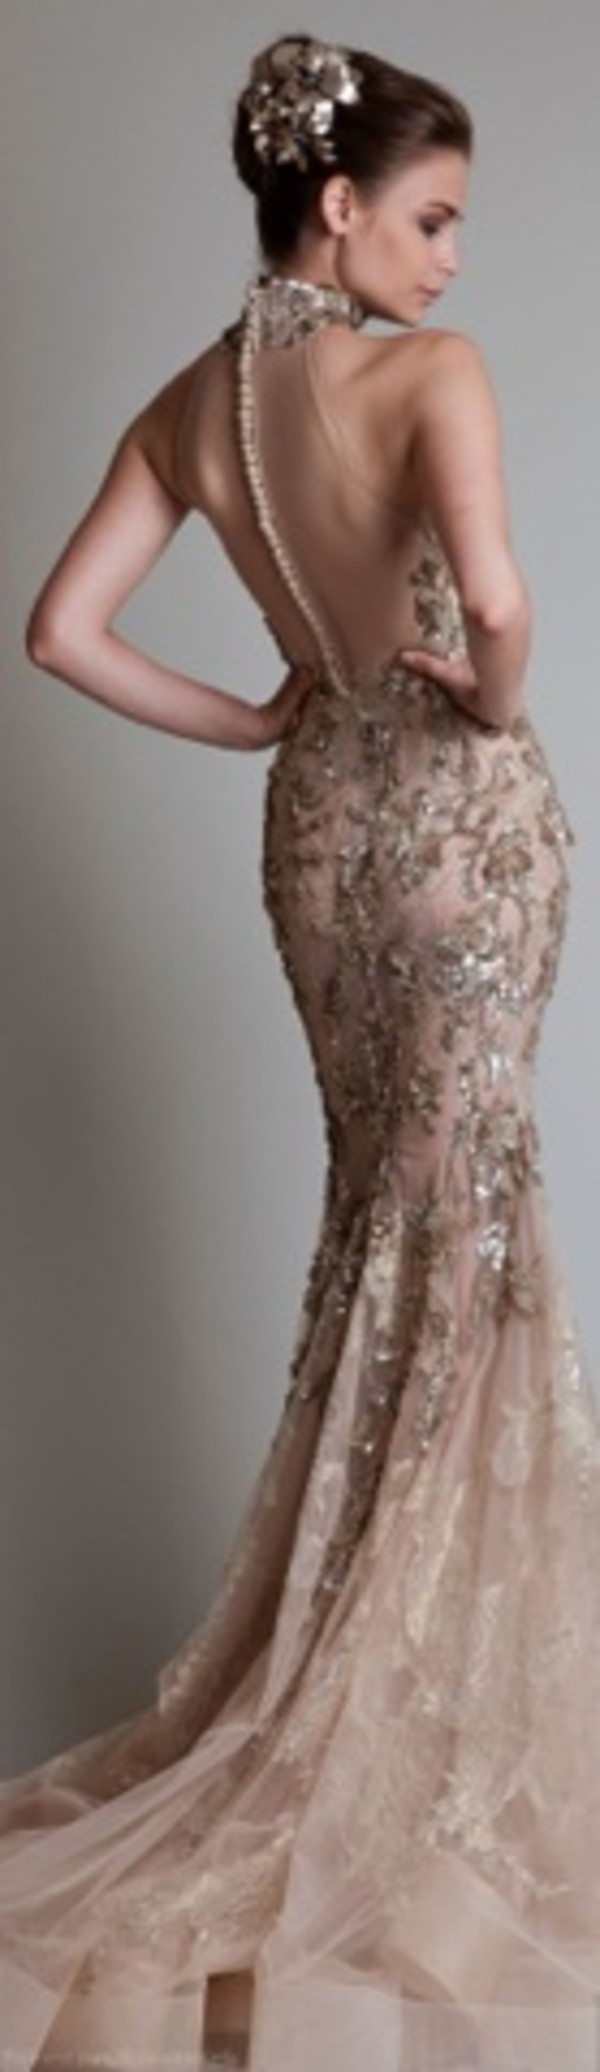 dress gold prom dress sequin dress